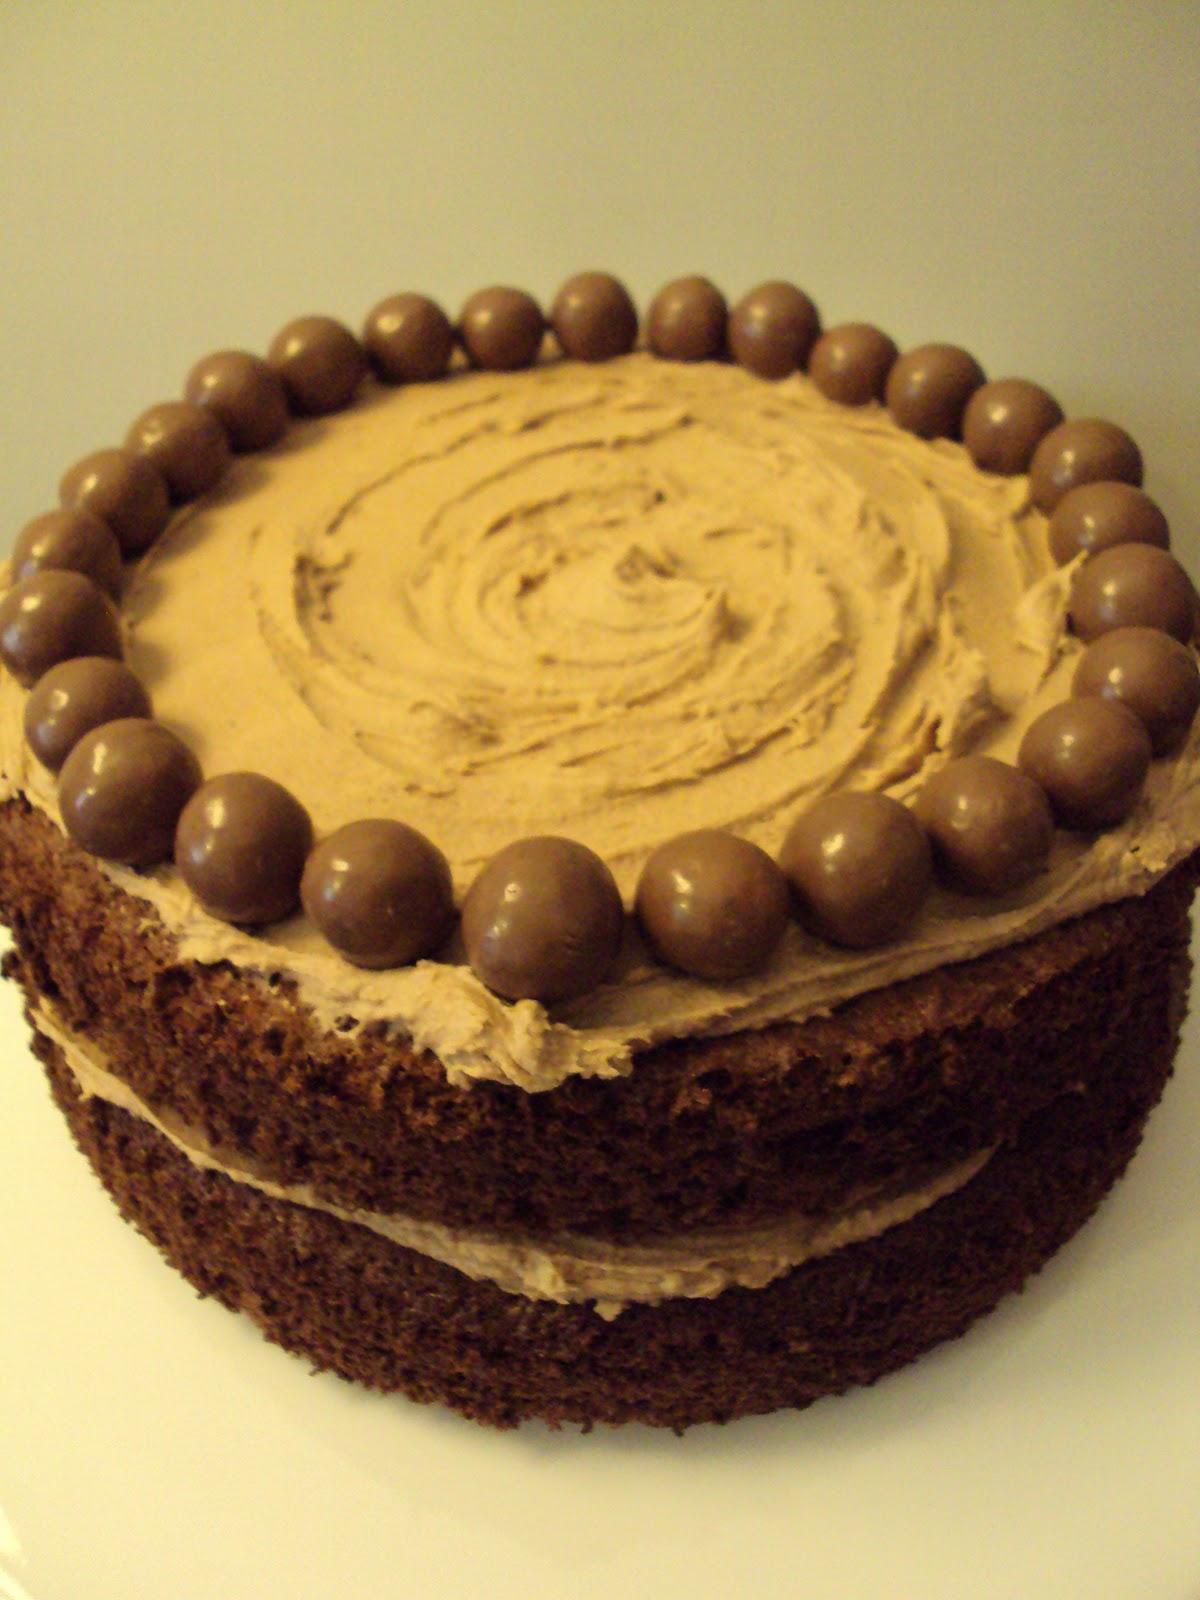 Me, My Food and I: Chocolate Malteser Cake